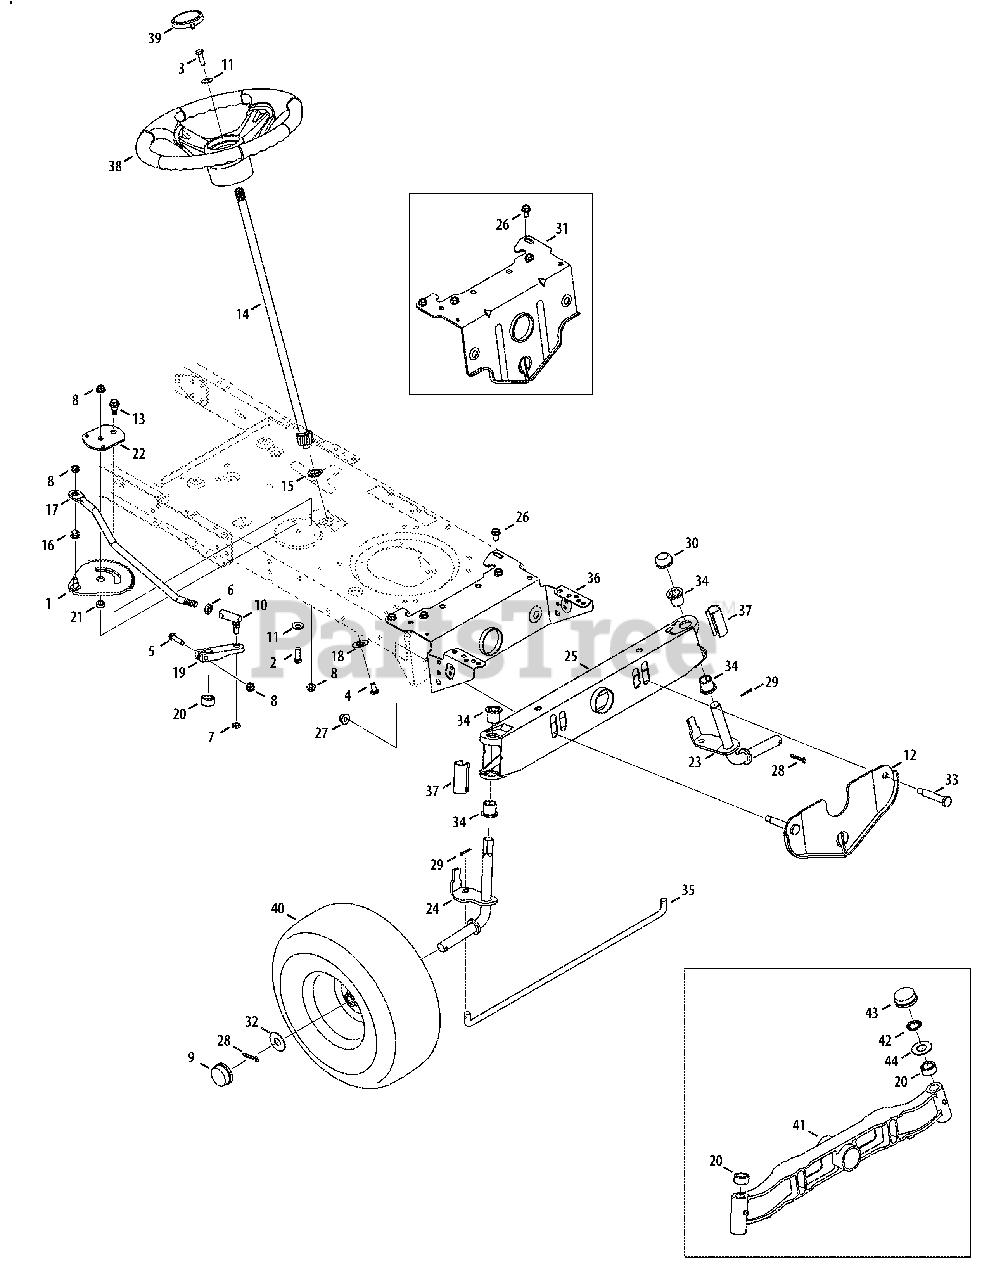 Troy Bilt Pony Parts Diagram : parts, diagram, Troy-Bilt, 13AN77KG011, Tractor, (2008), Steering, Front, Parts, Lookup, Diagrams, PartsTree